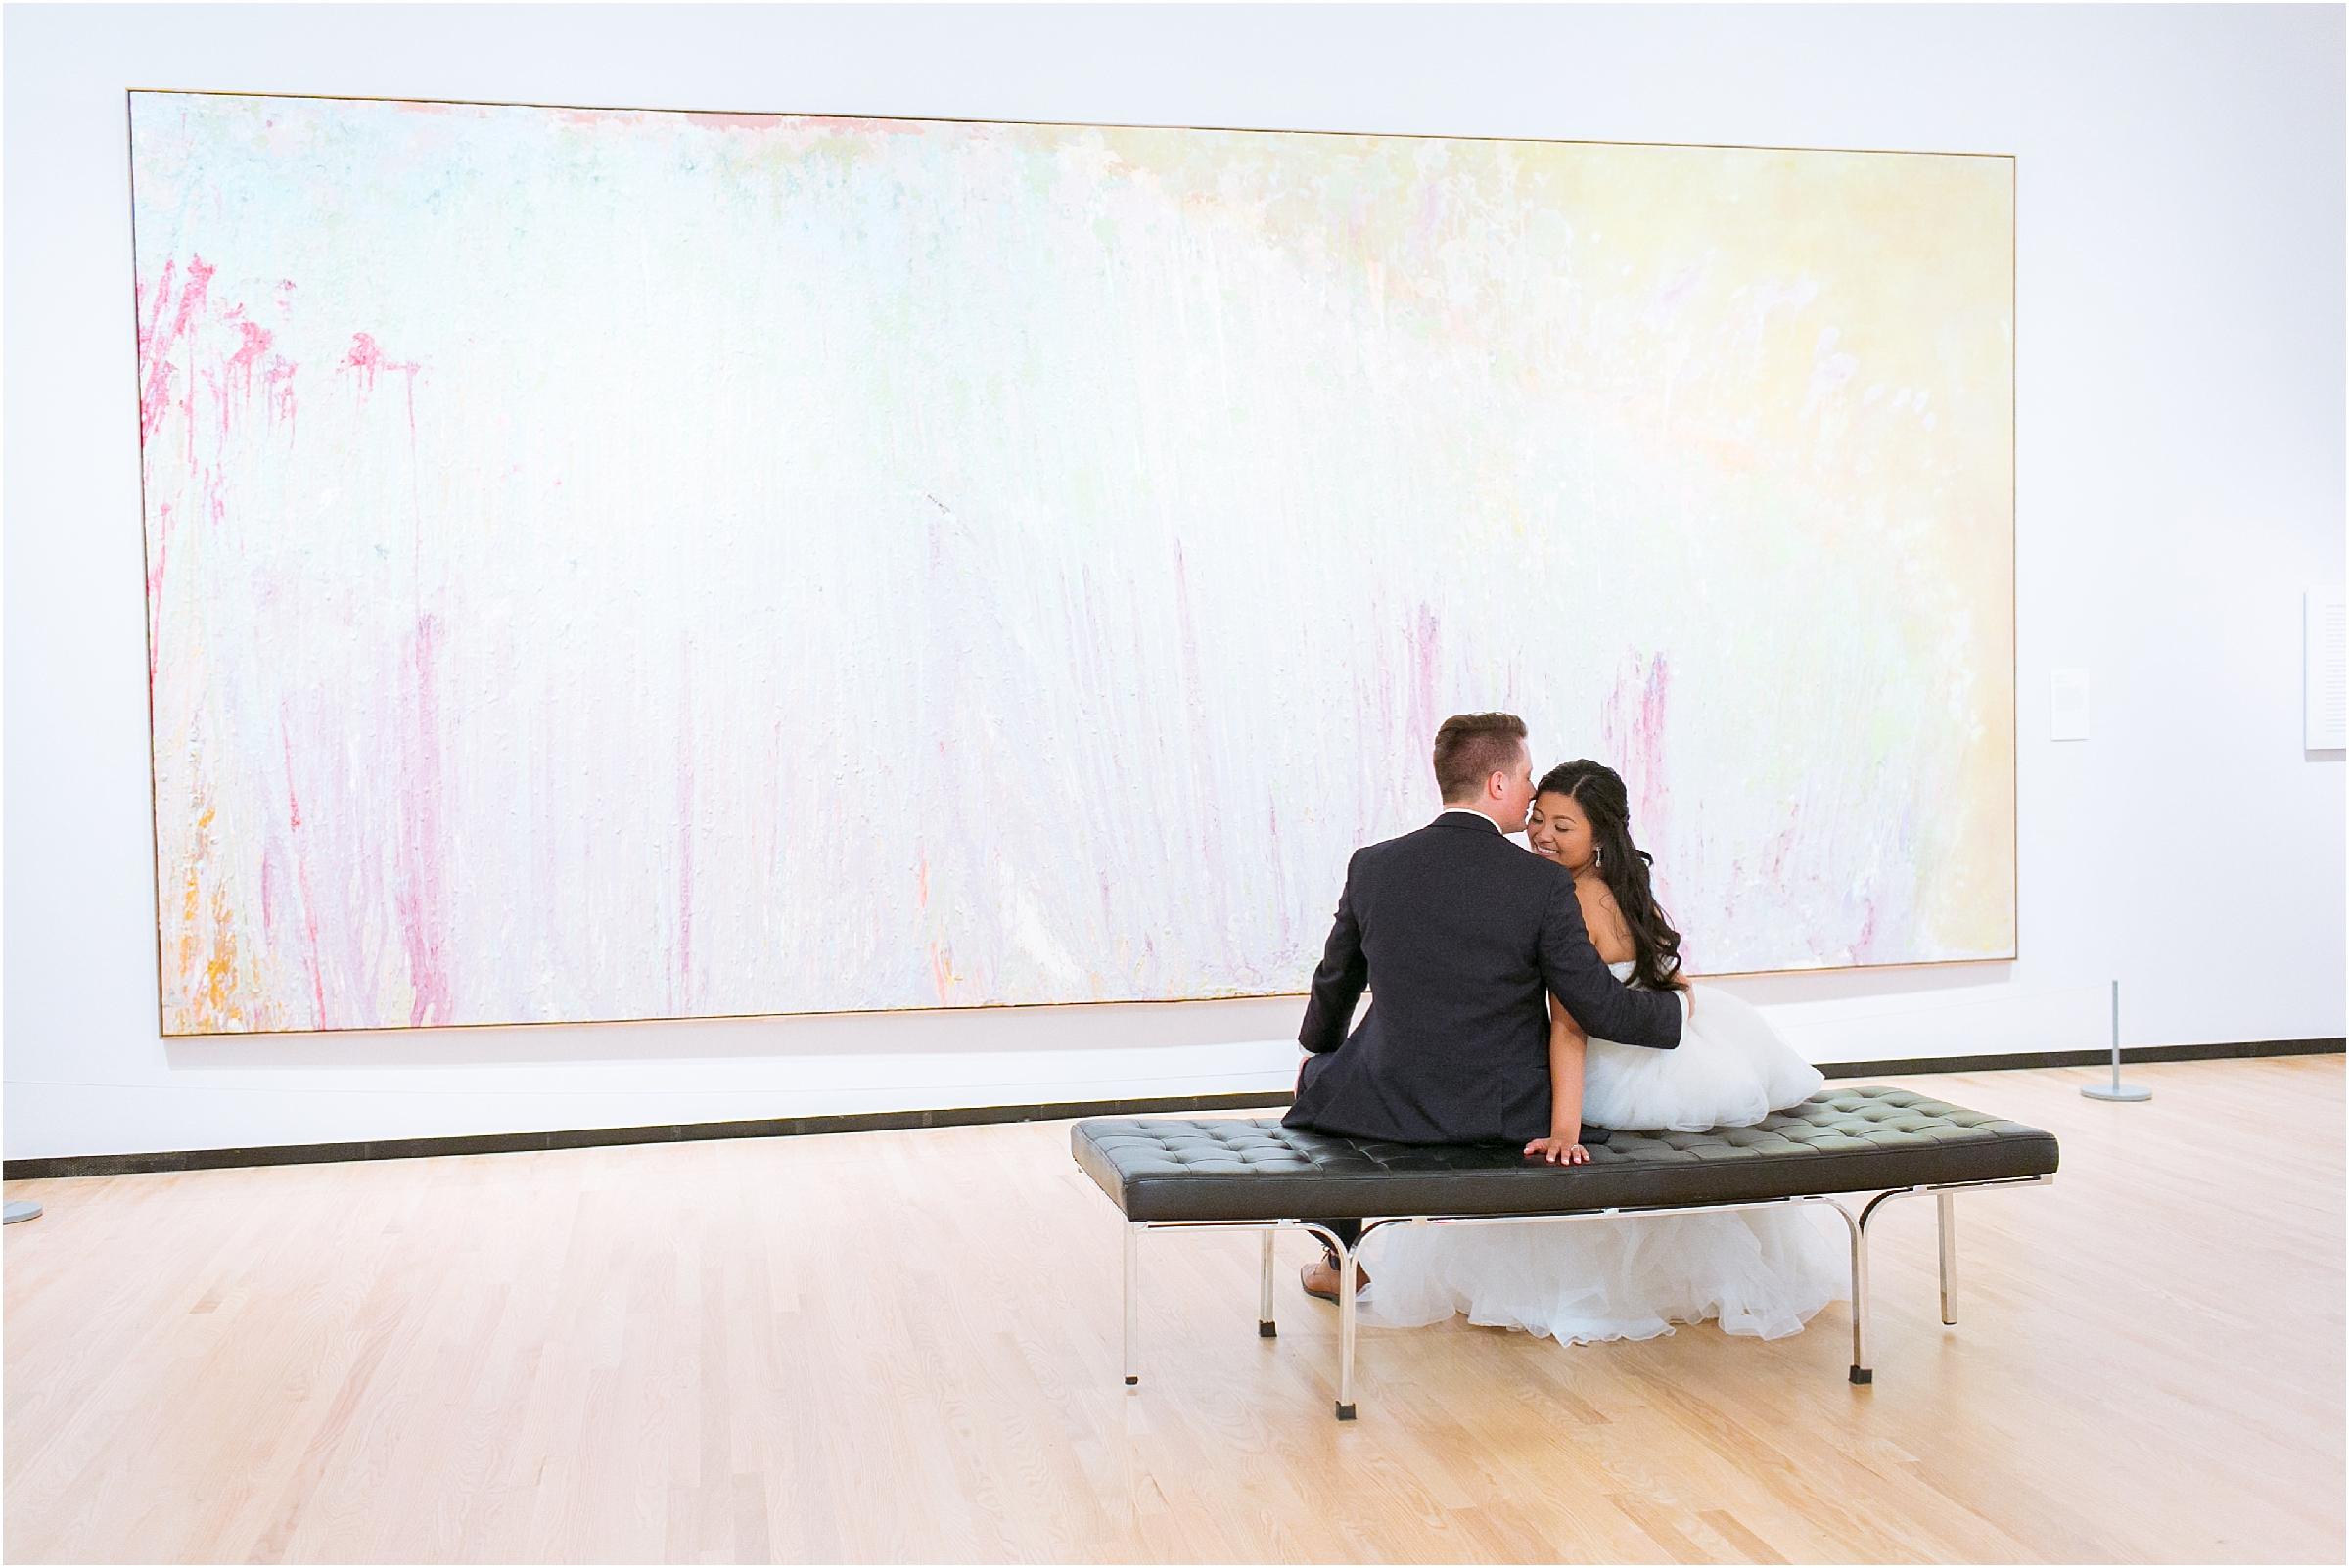 Chrysler Museum of Art elegant wedding portraits in the art gallery